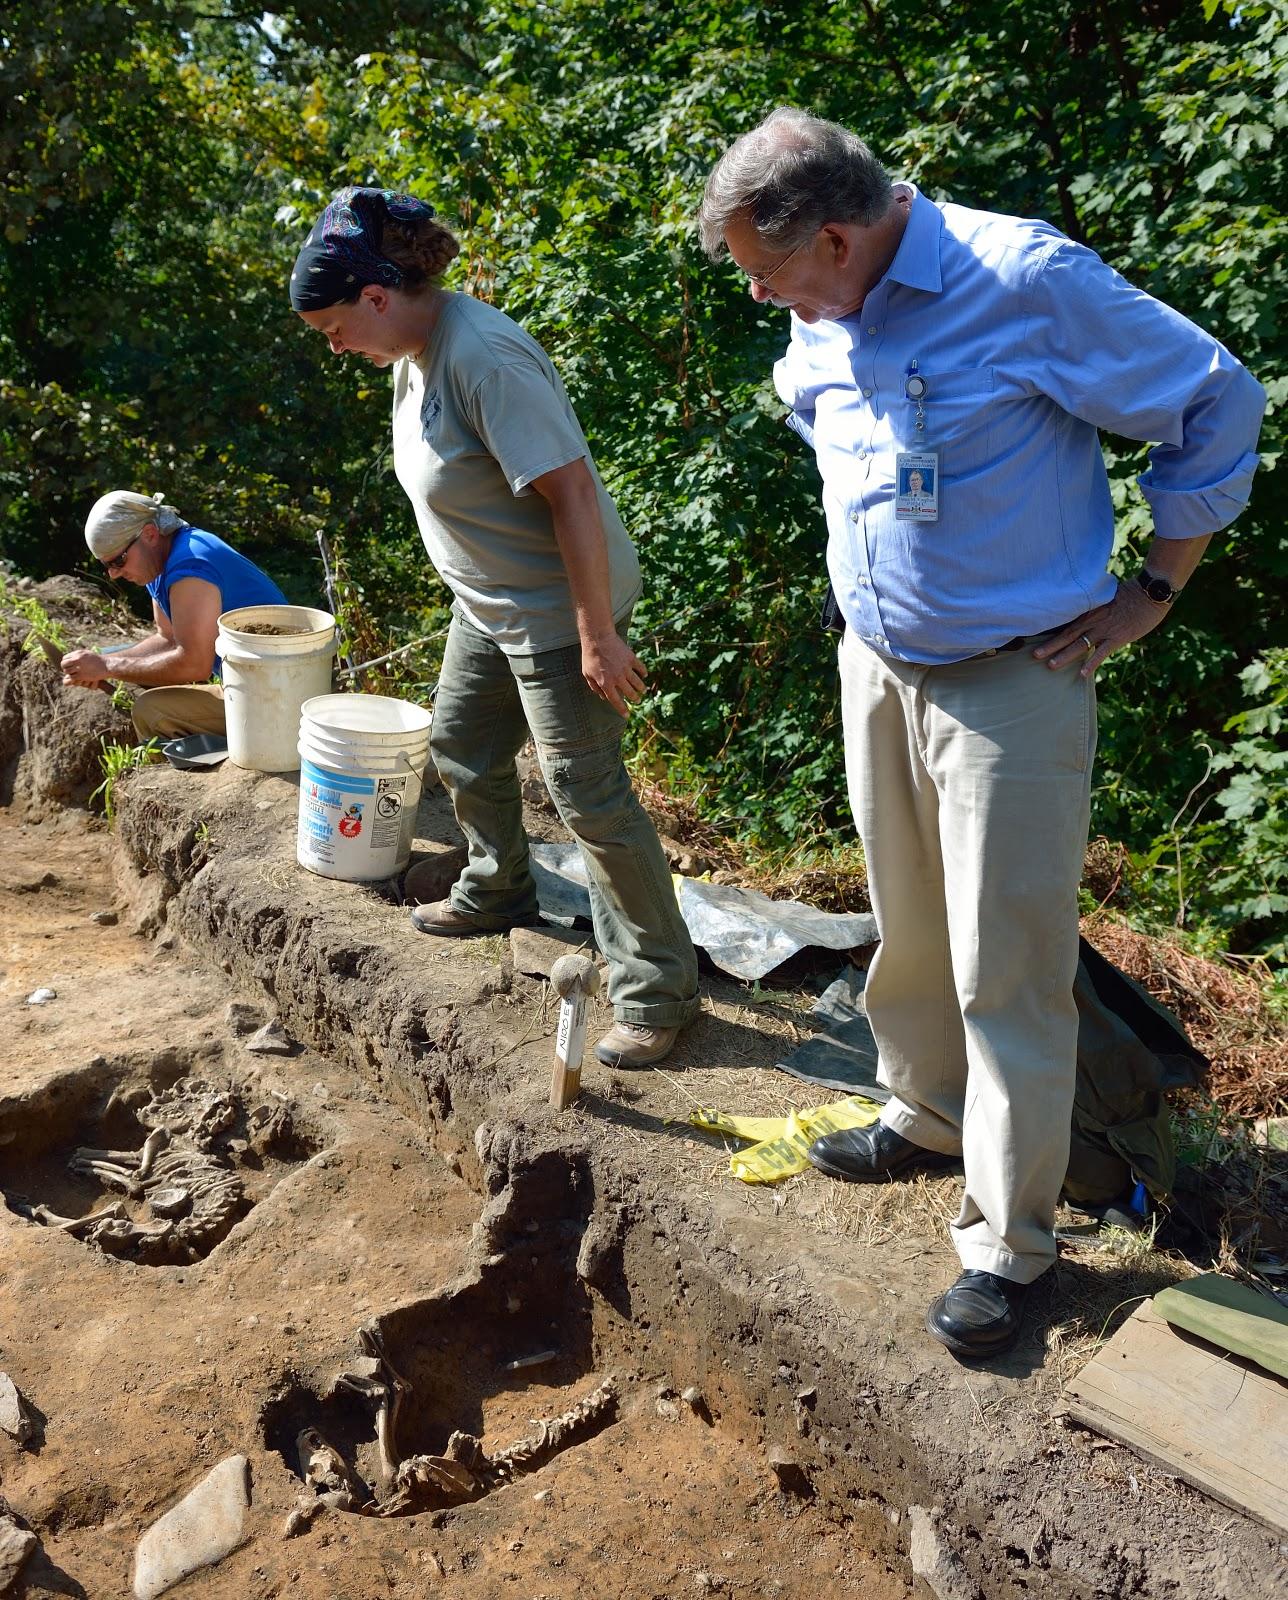 Phmc Pennsylvania Archaeology: This Week In Pennsylvania Archaeology: On The Road At Fort